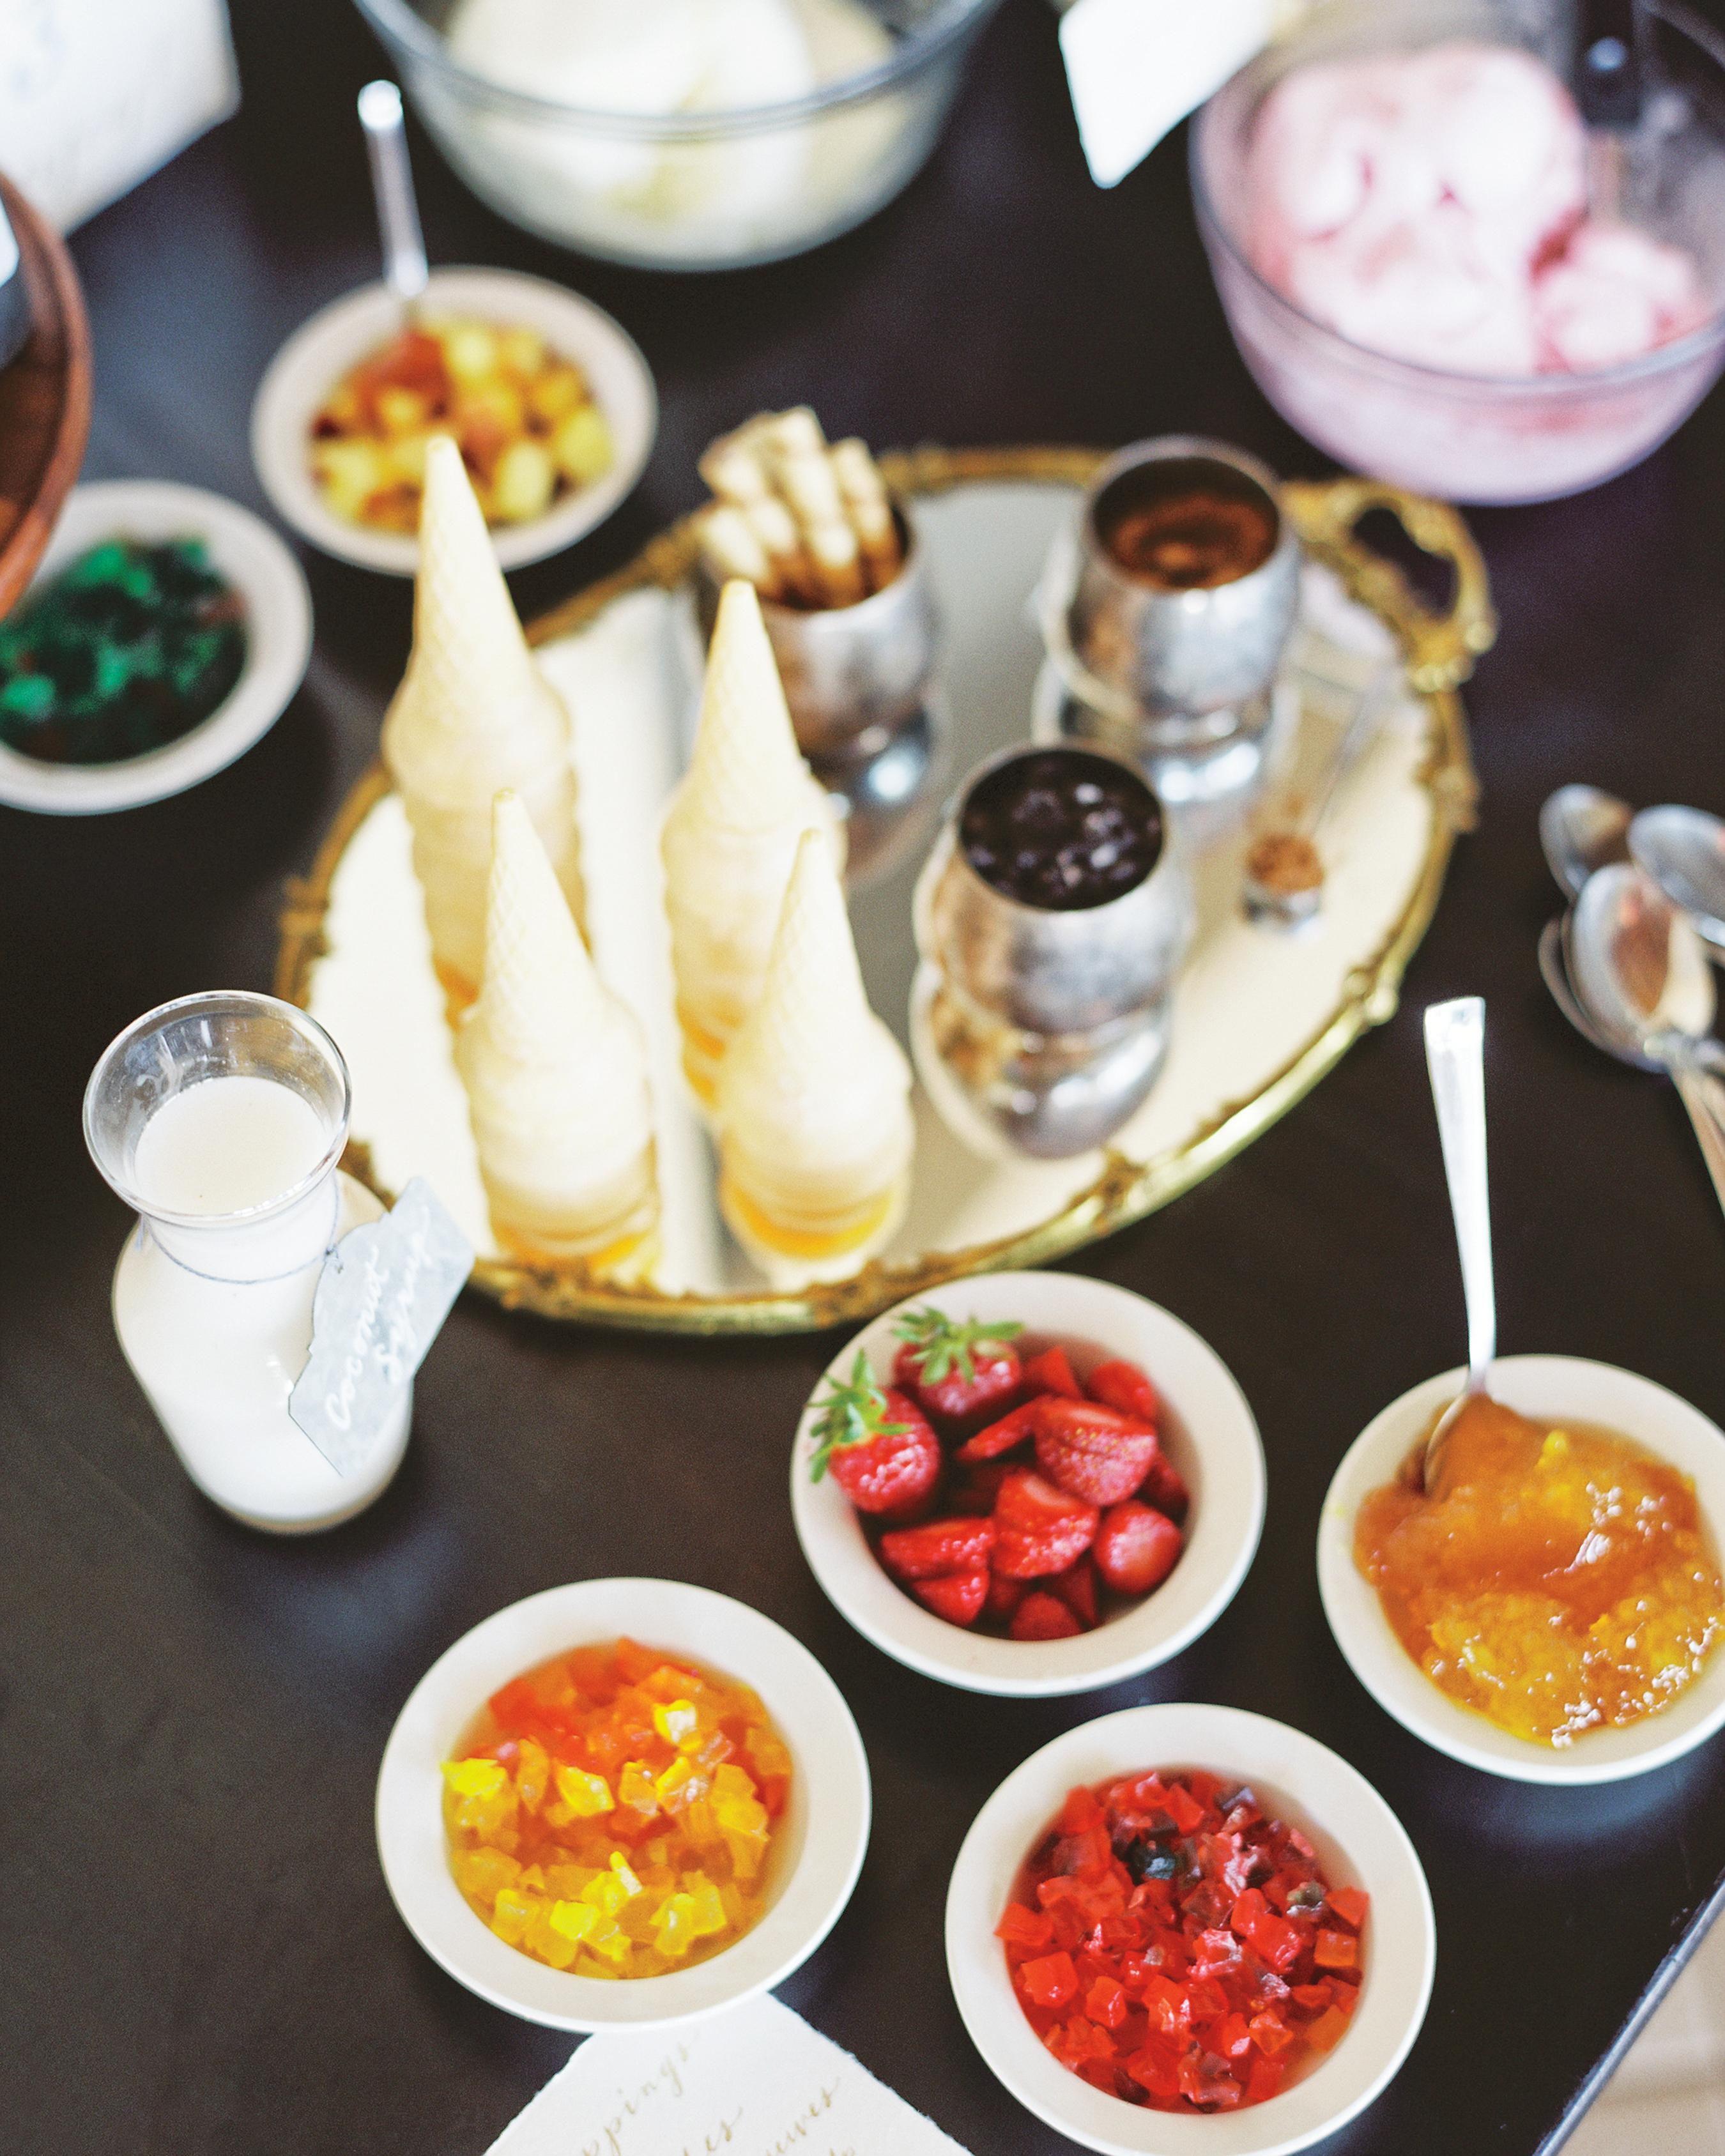 sierra-michael-dessert-154-mmwds110371.jpg